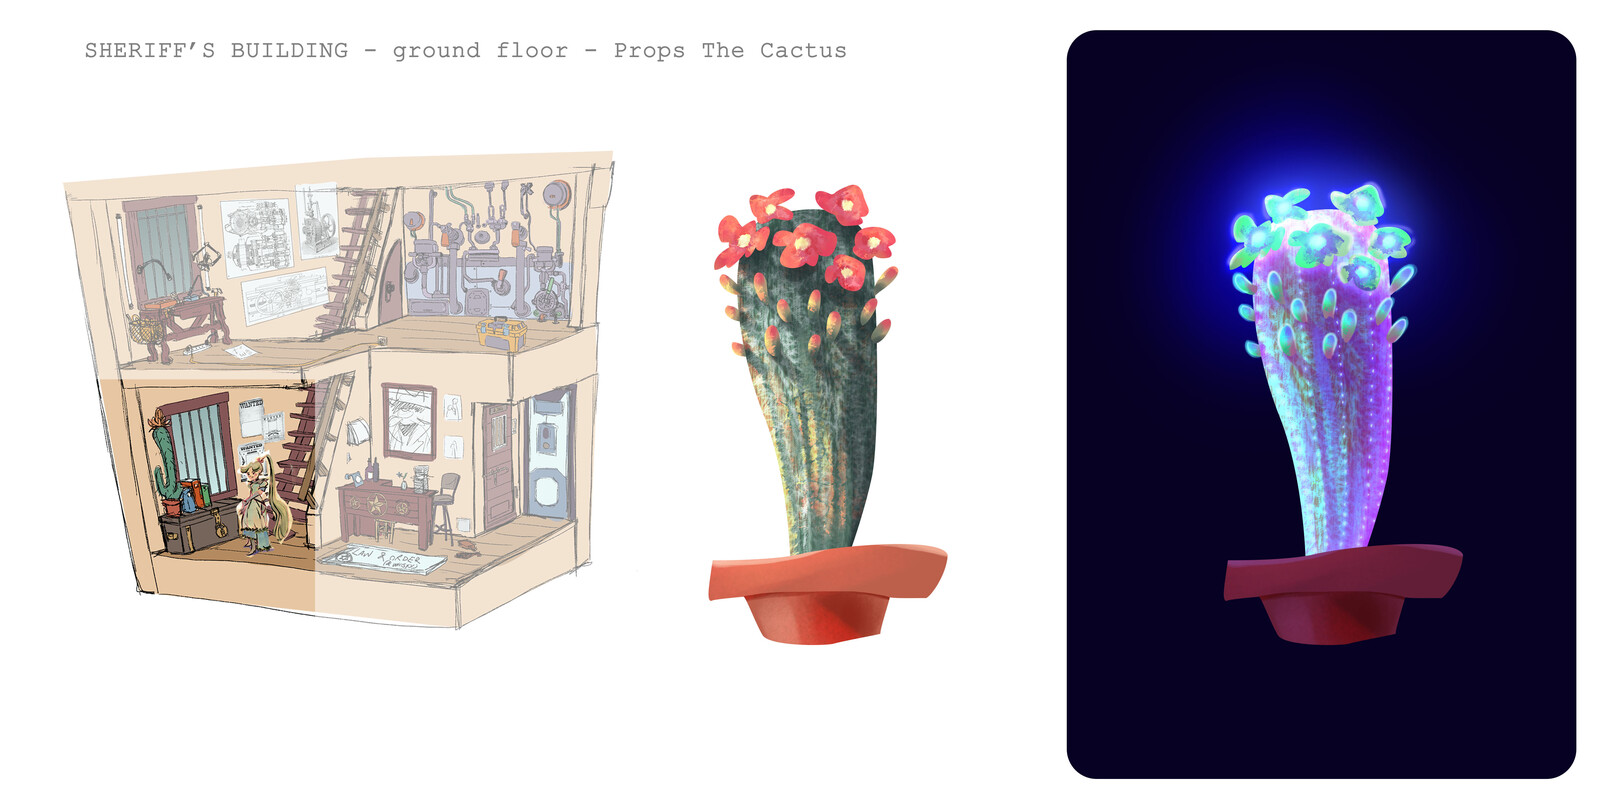 [RESTLESS] - Sheriff's building - Ground floor - PROPS - Cactus